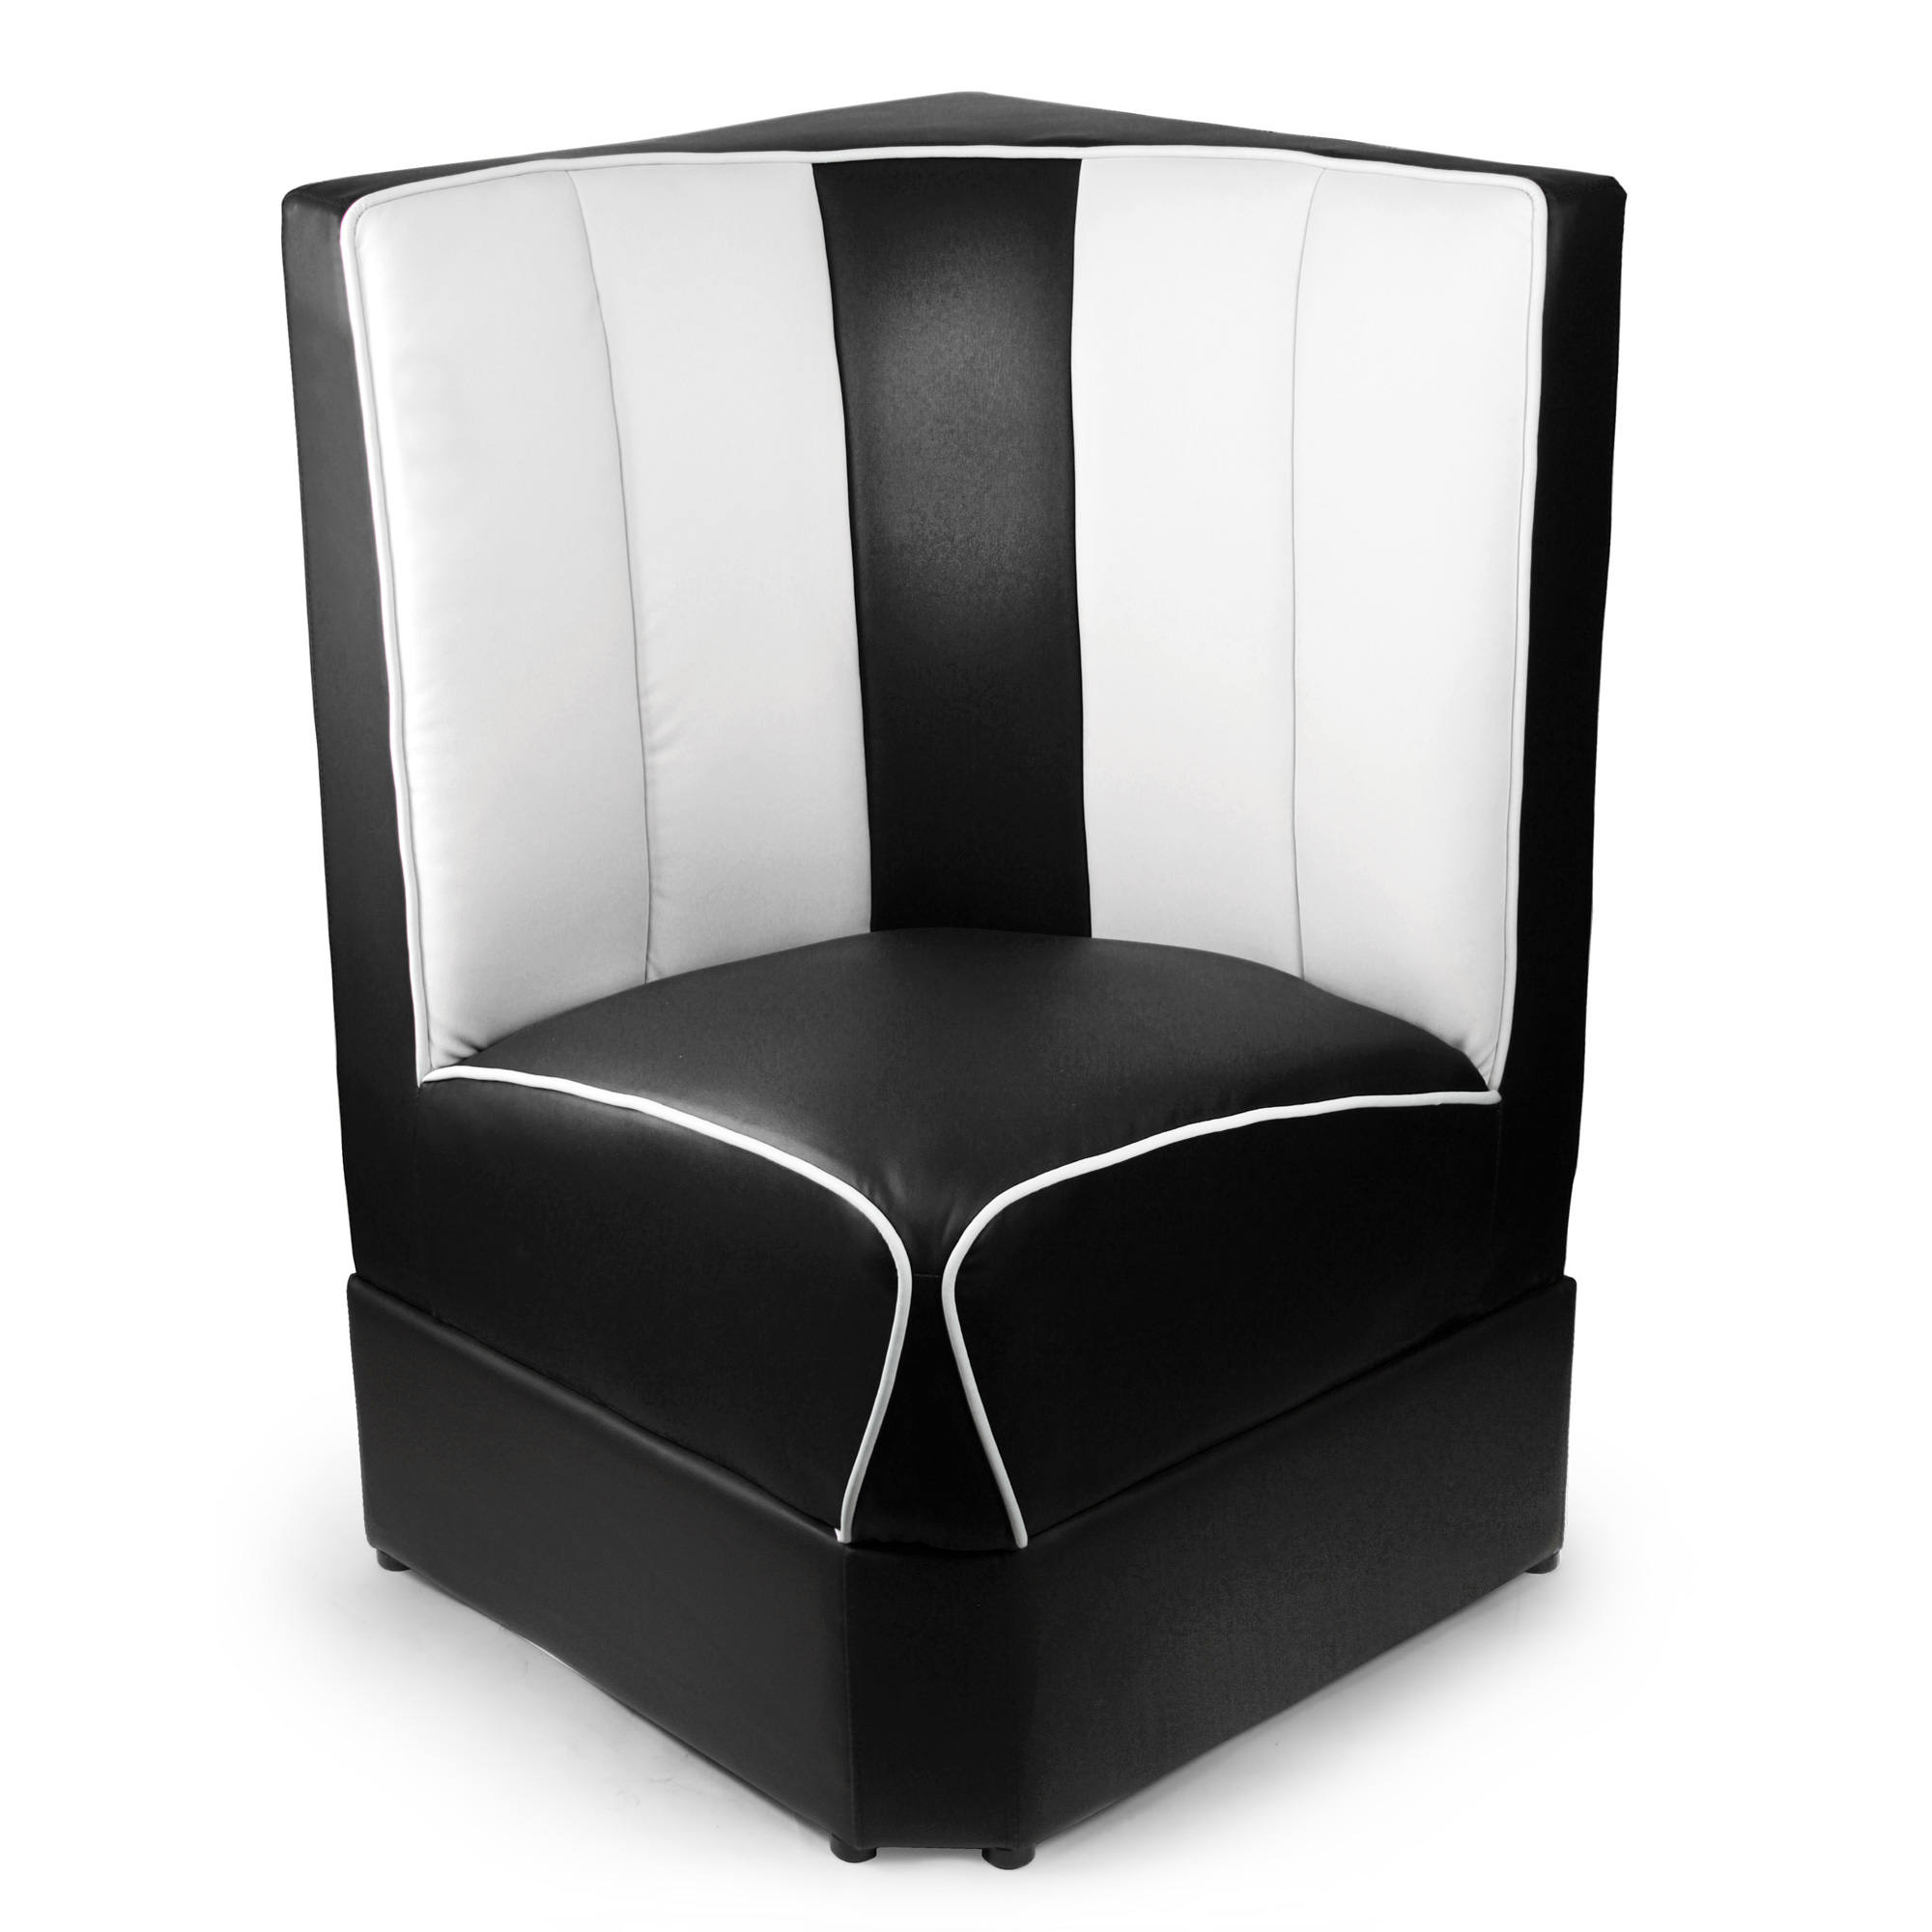 Retro Diner Booth Corner Seat Black Drinkstuff